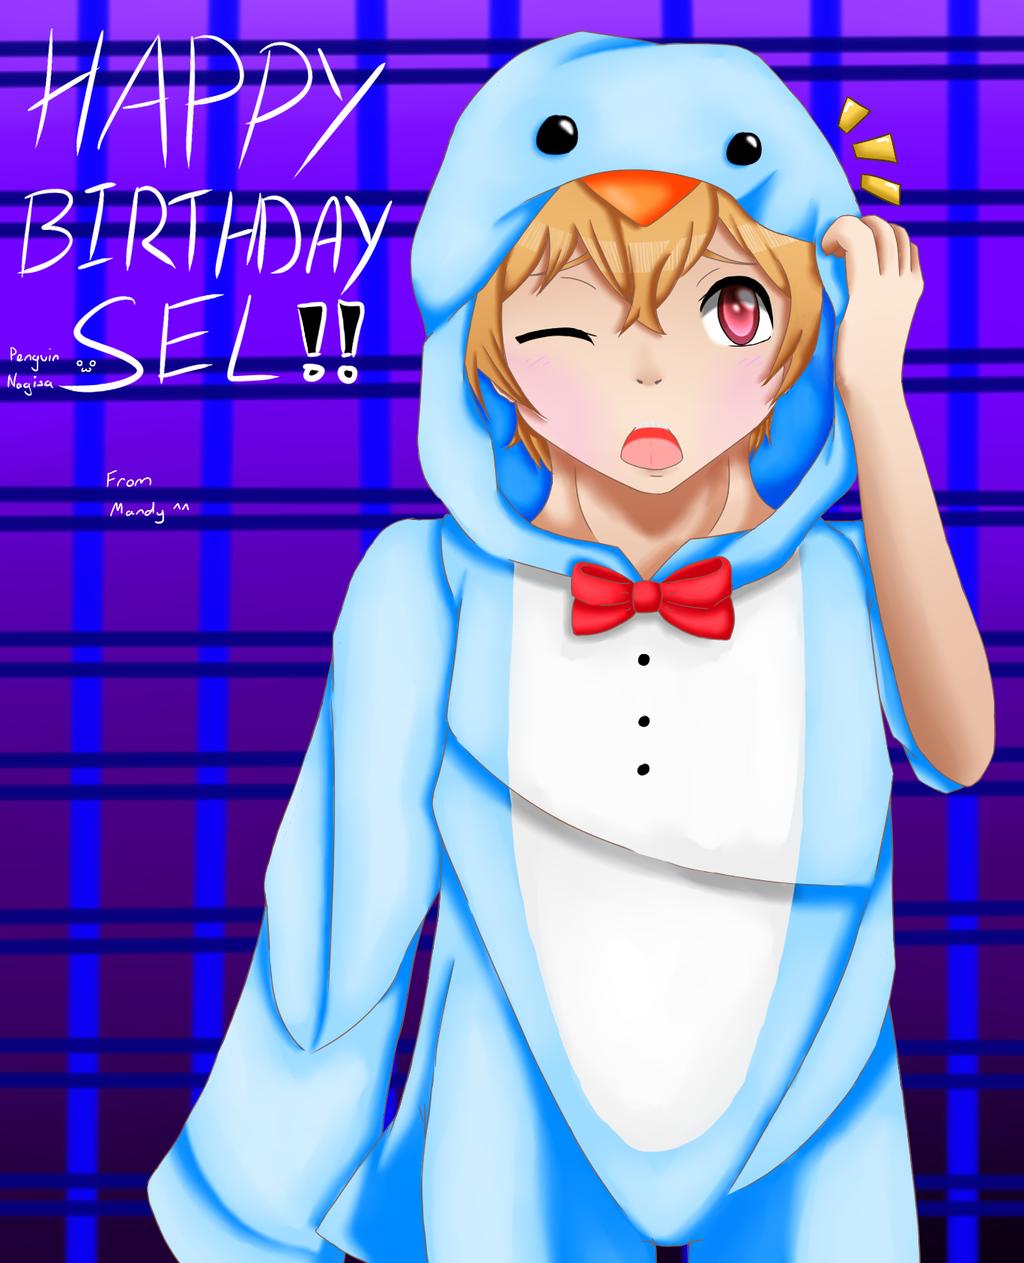 Happy birthday selsel. :D